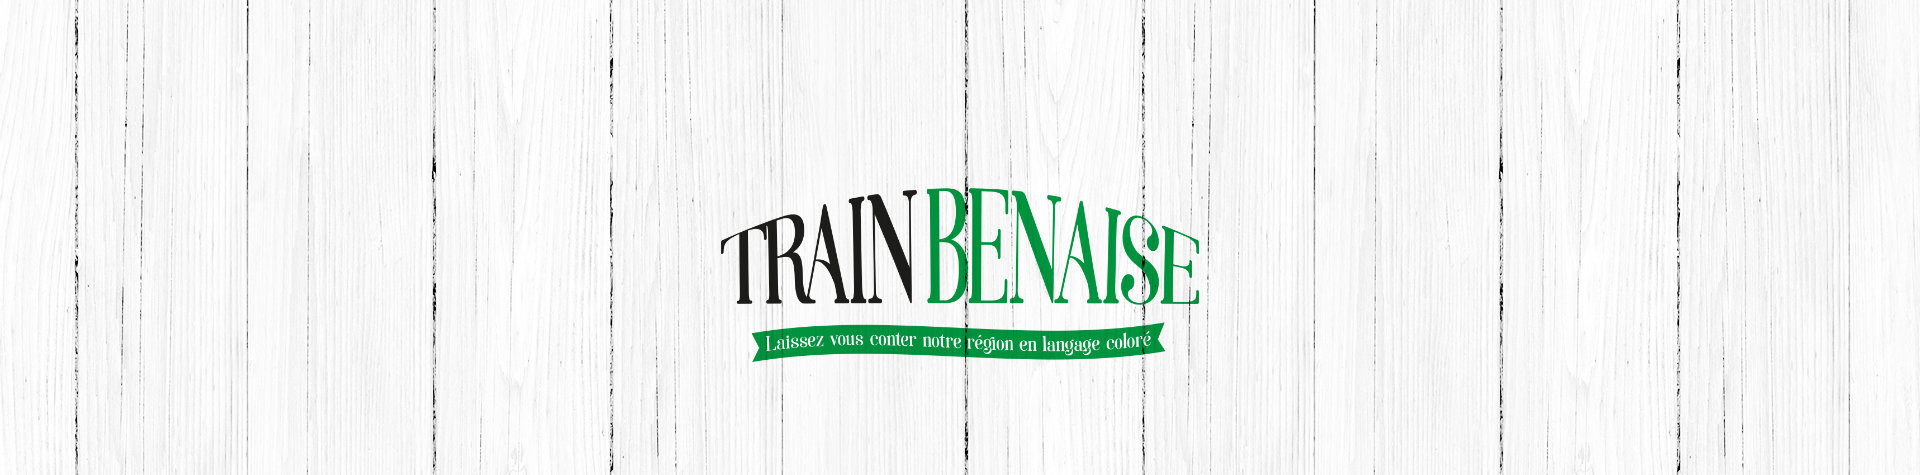 Train Benaise